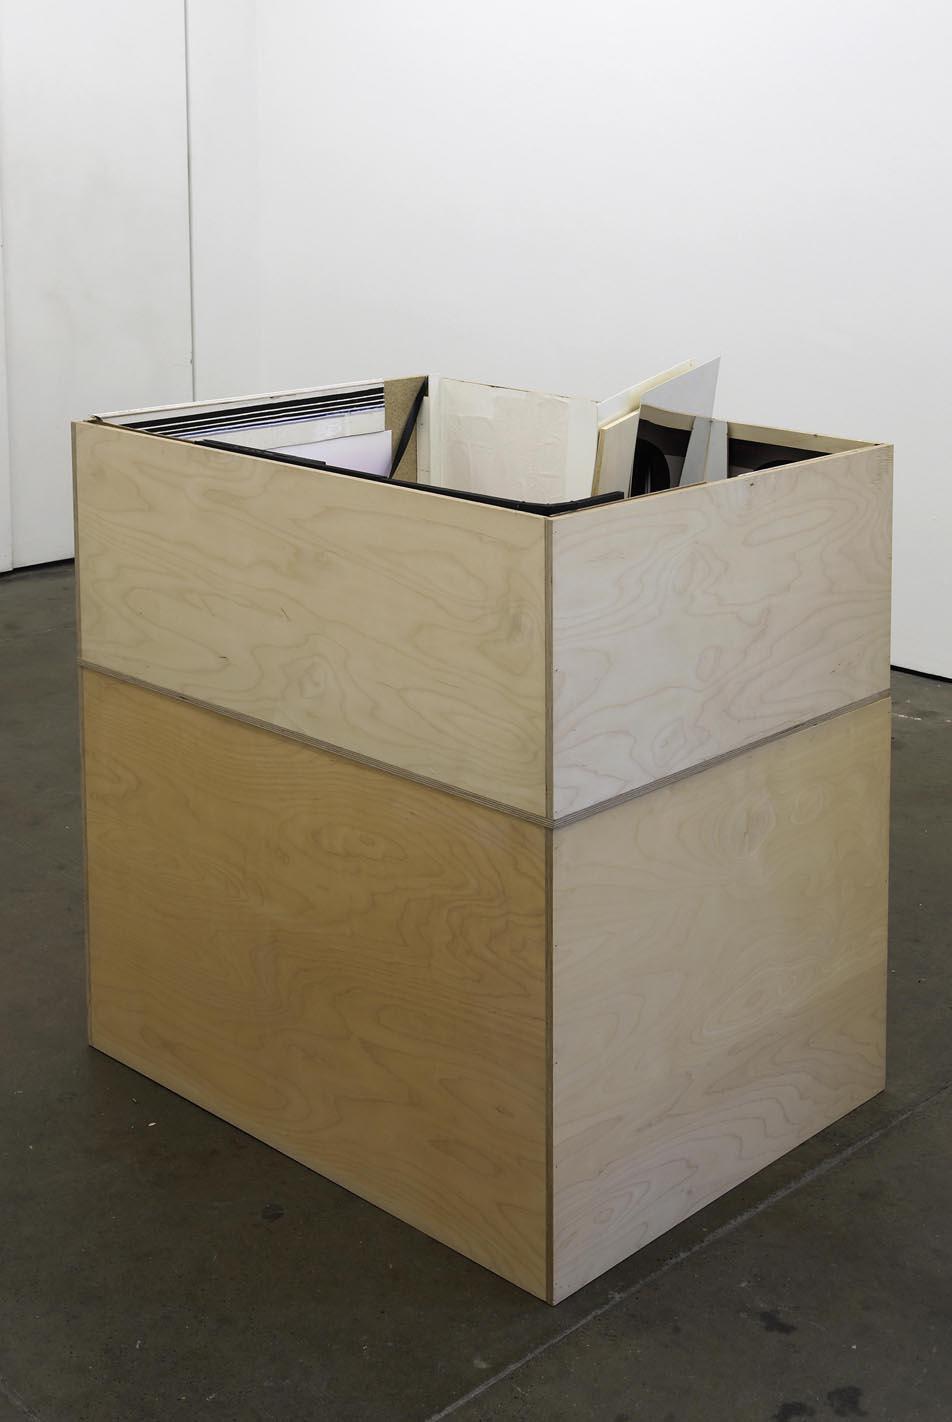 Nicole Wermers V4 2001 mixed media 103 x 95 x 75 cm